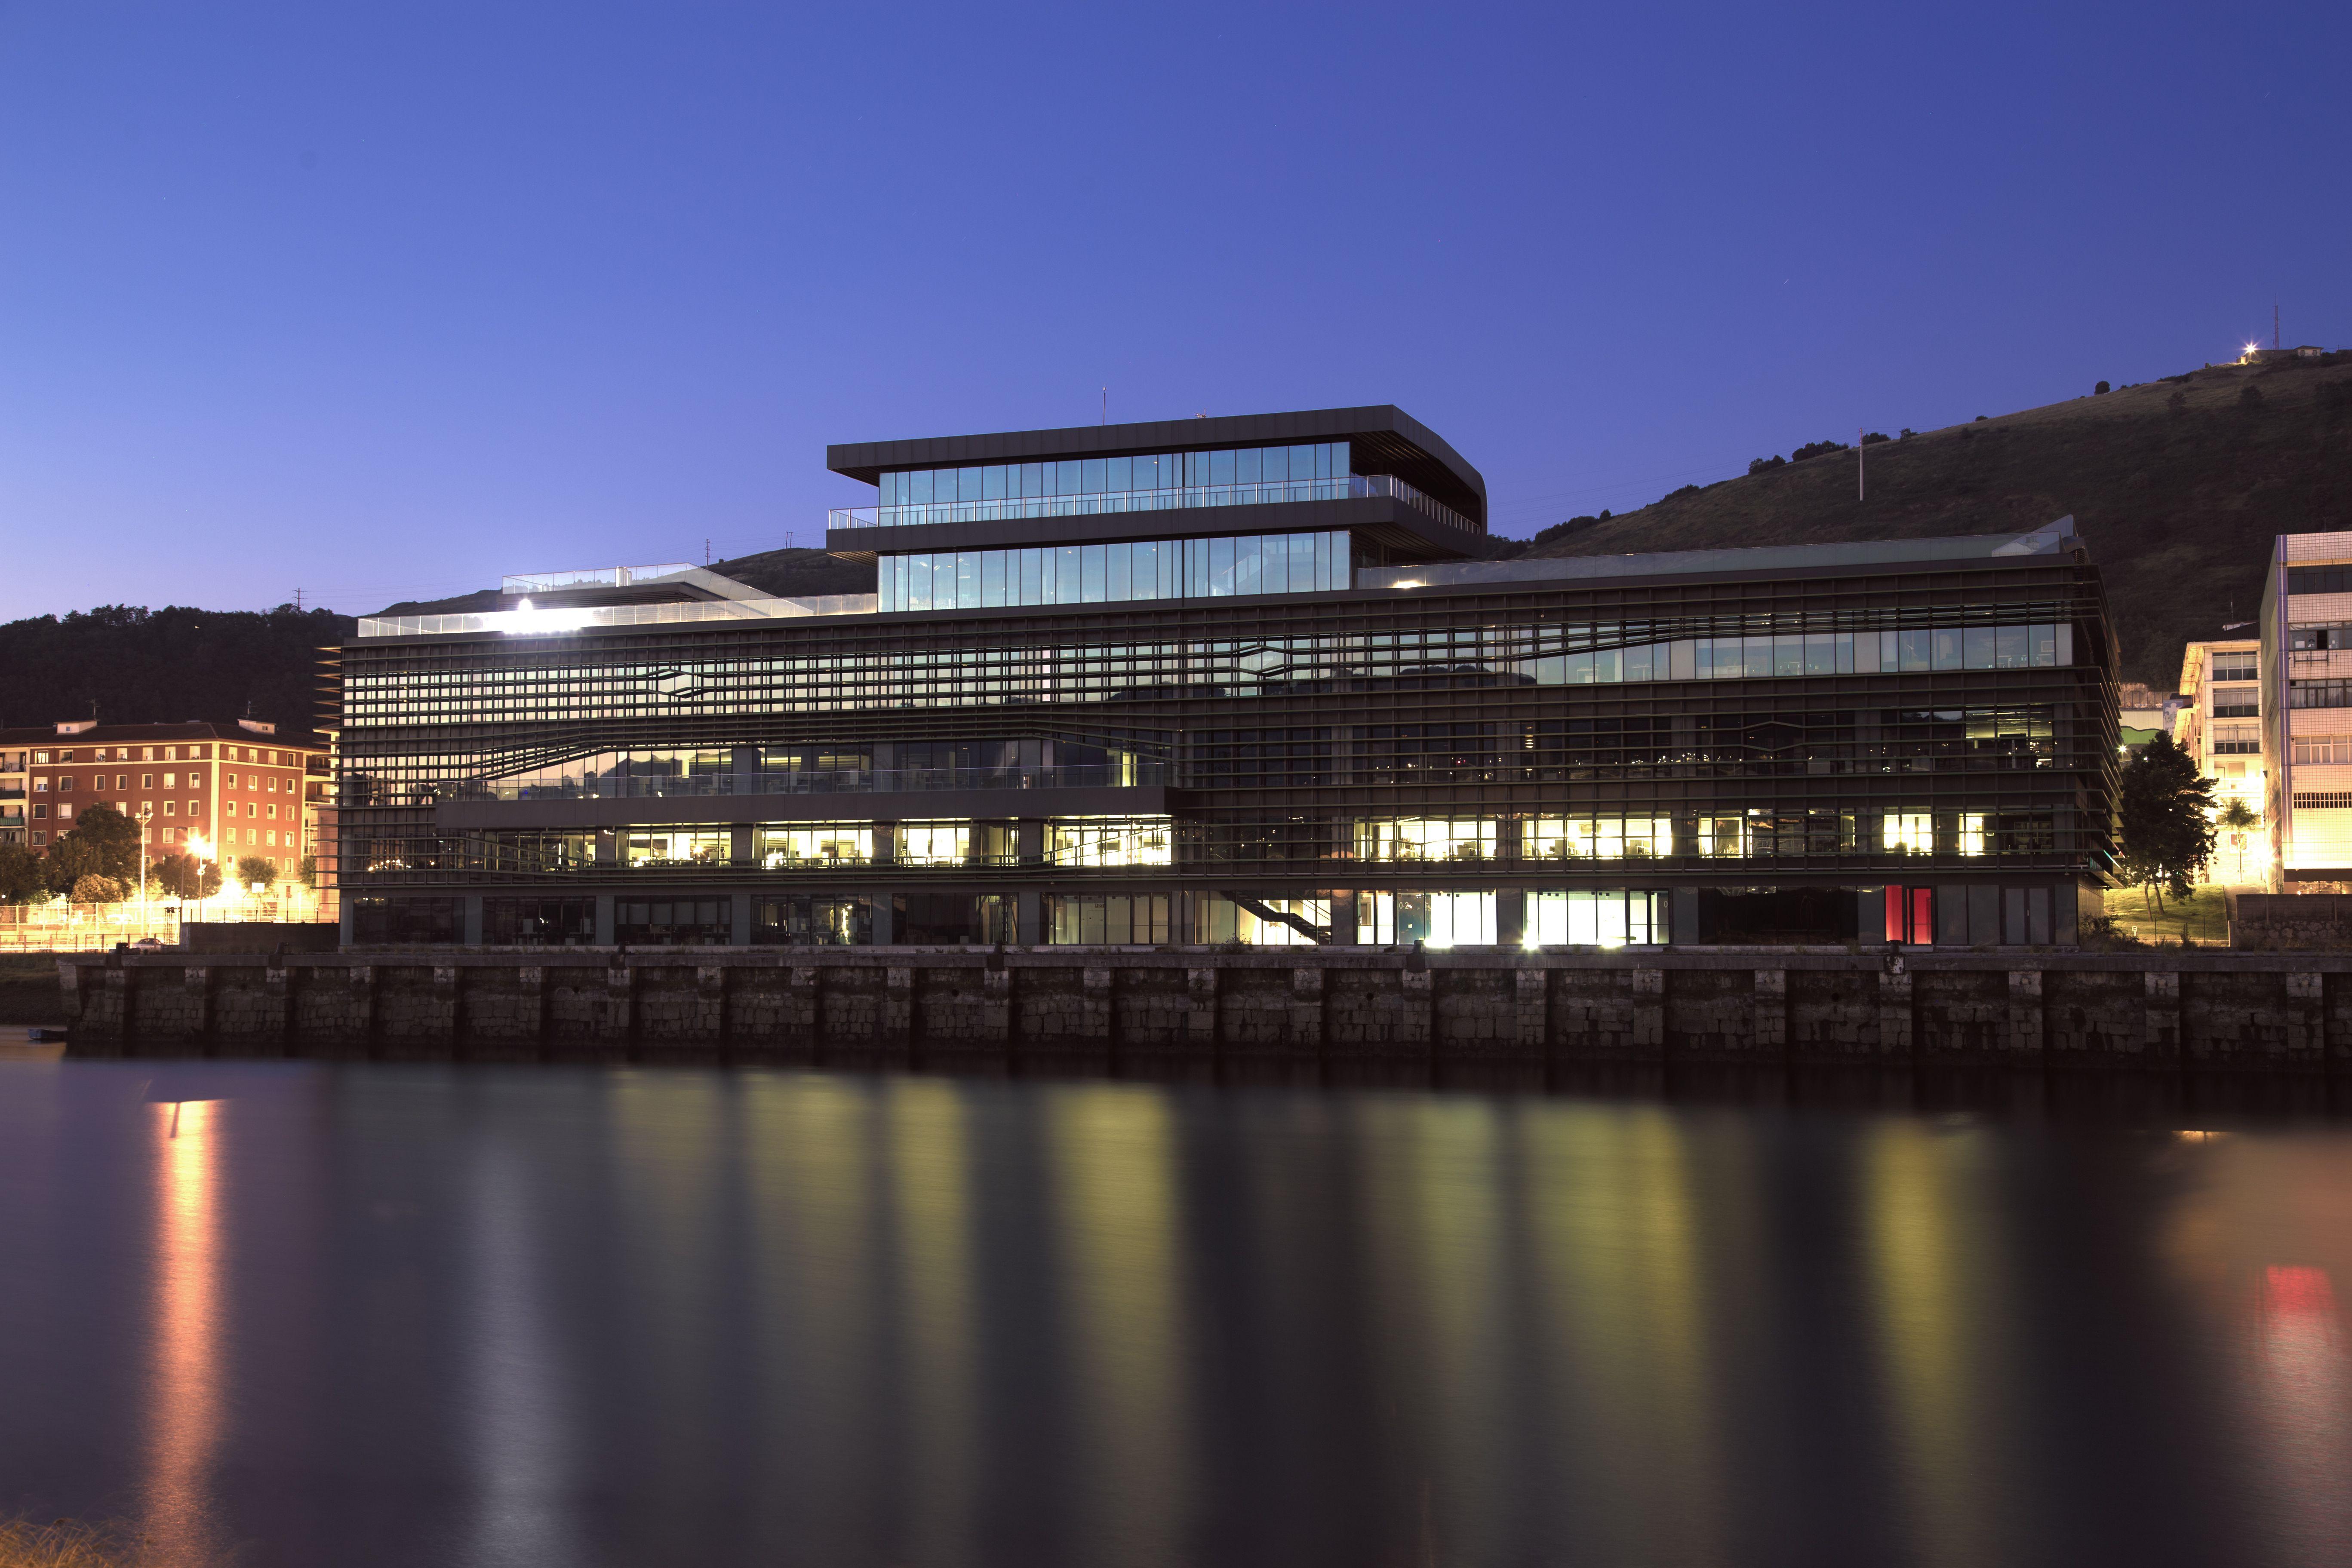 Sede de Idom en Bilbao, Bizkaia. Fotografía de Banila Design Studio.